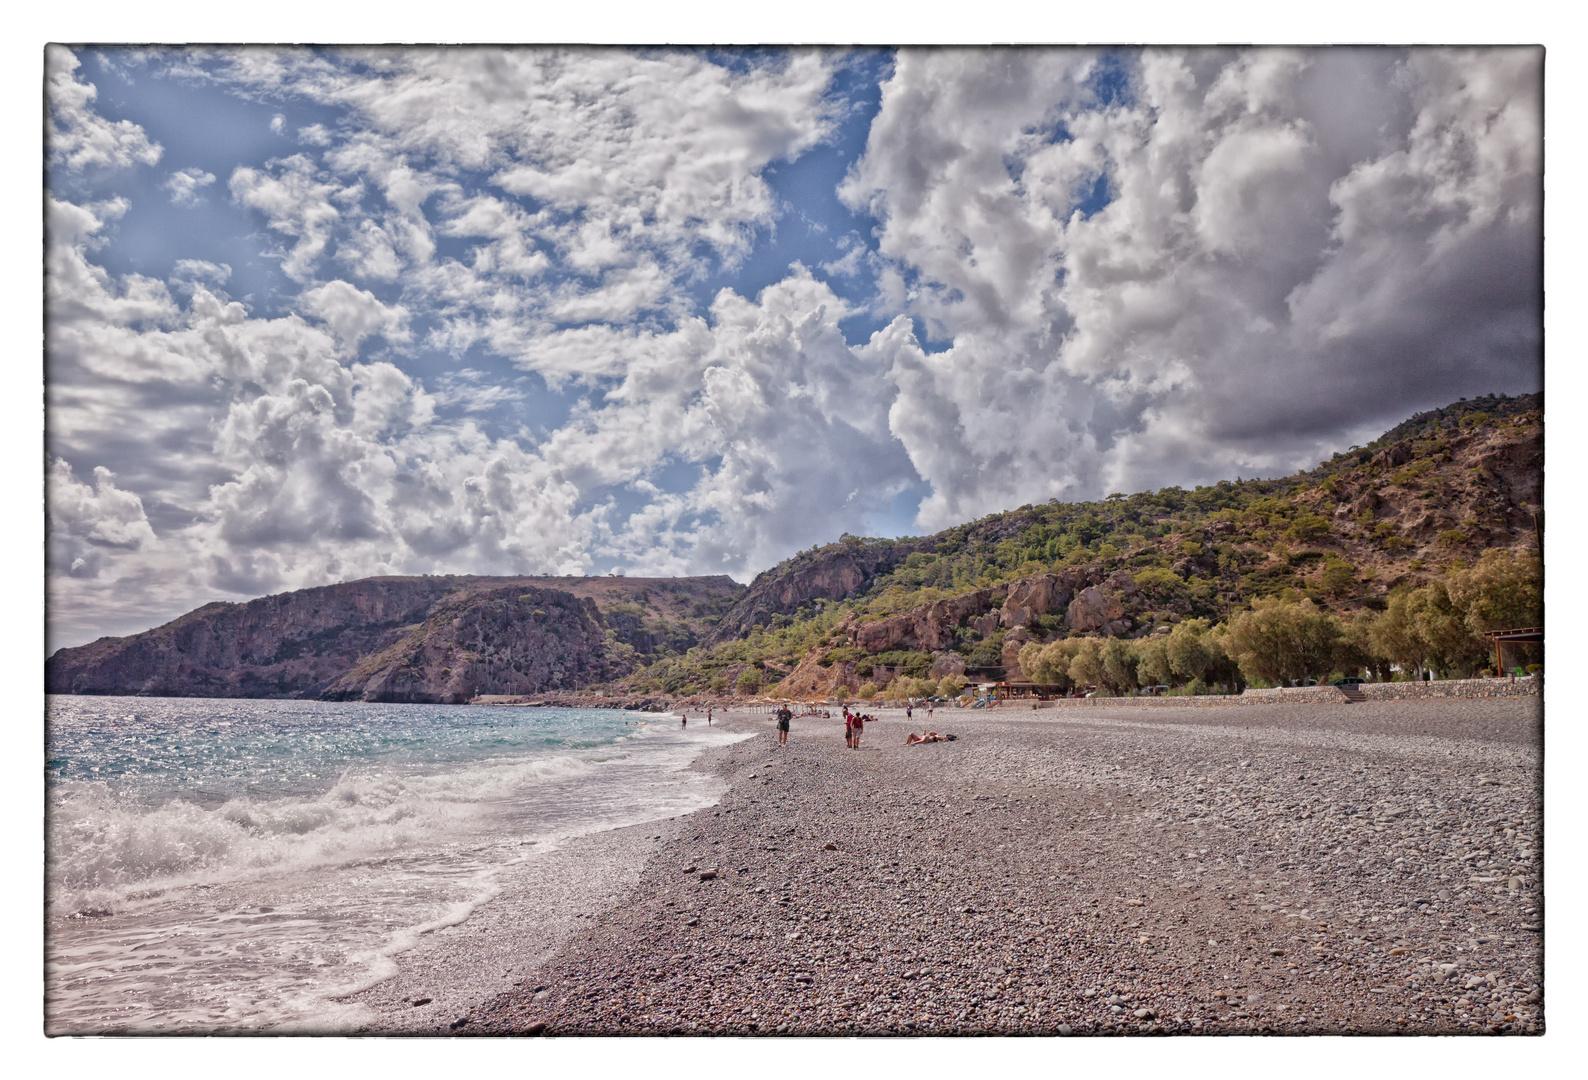 Die andere Seite vom Strand in Sougia